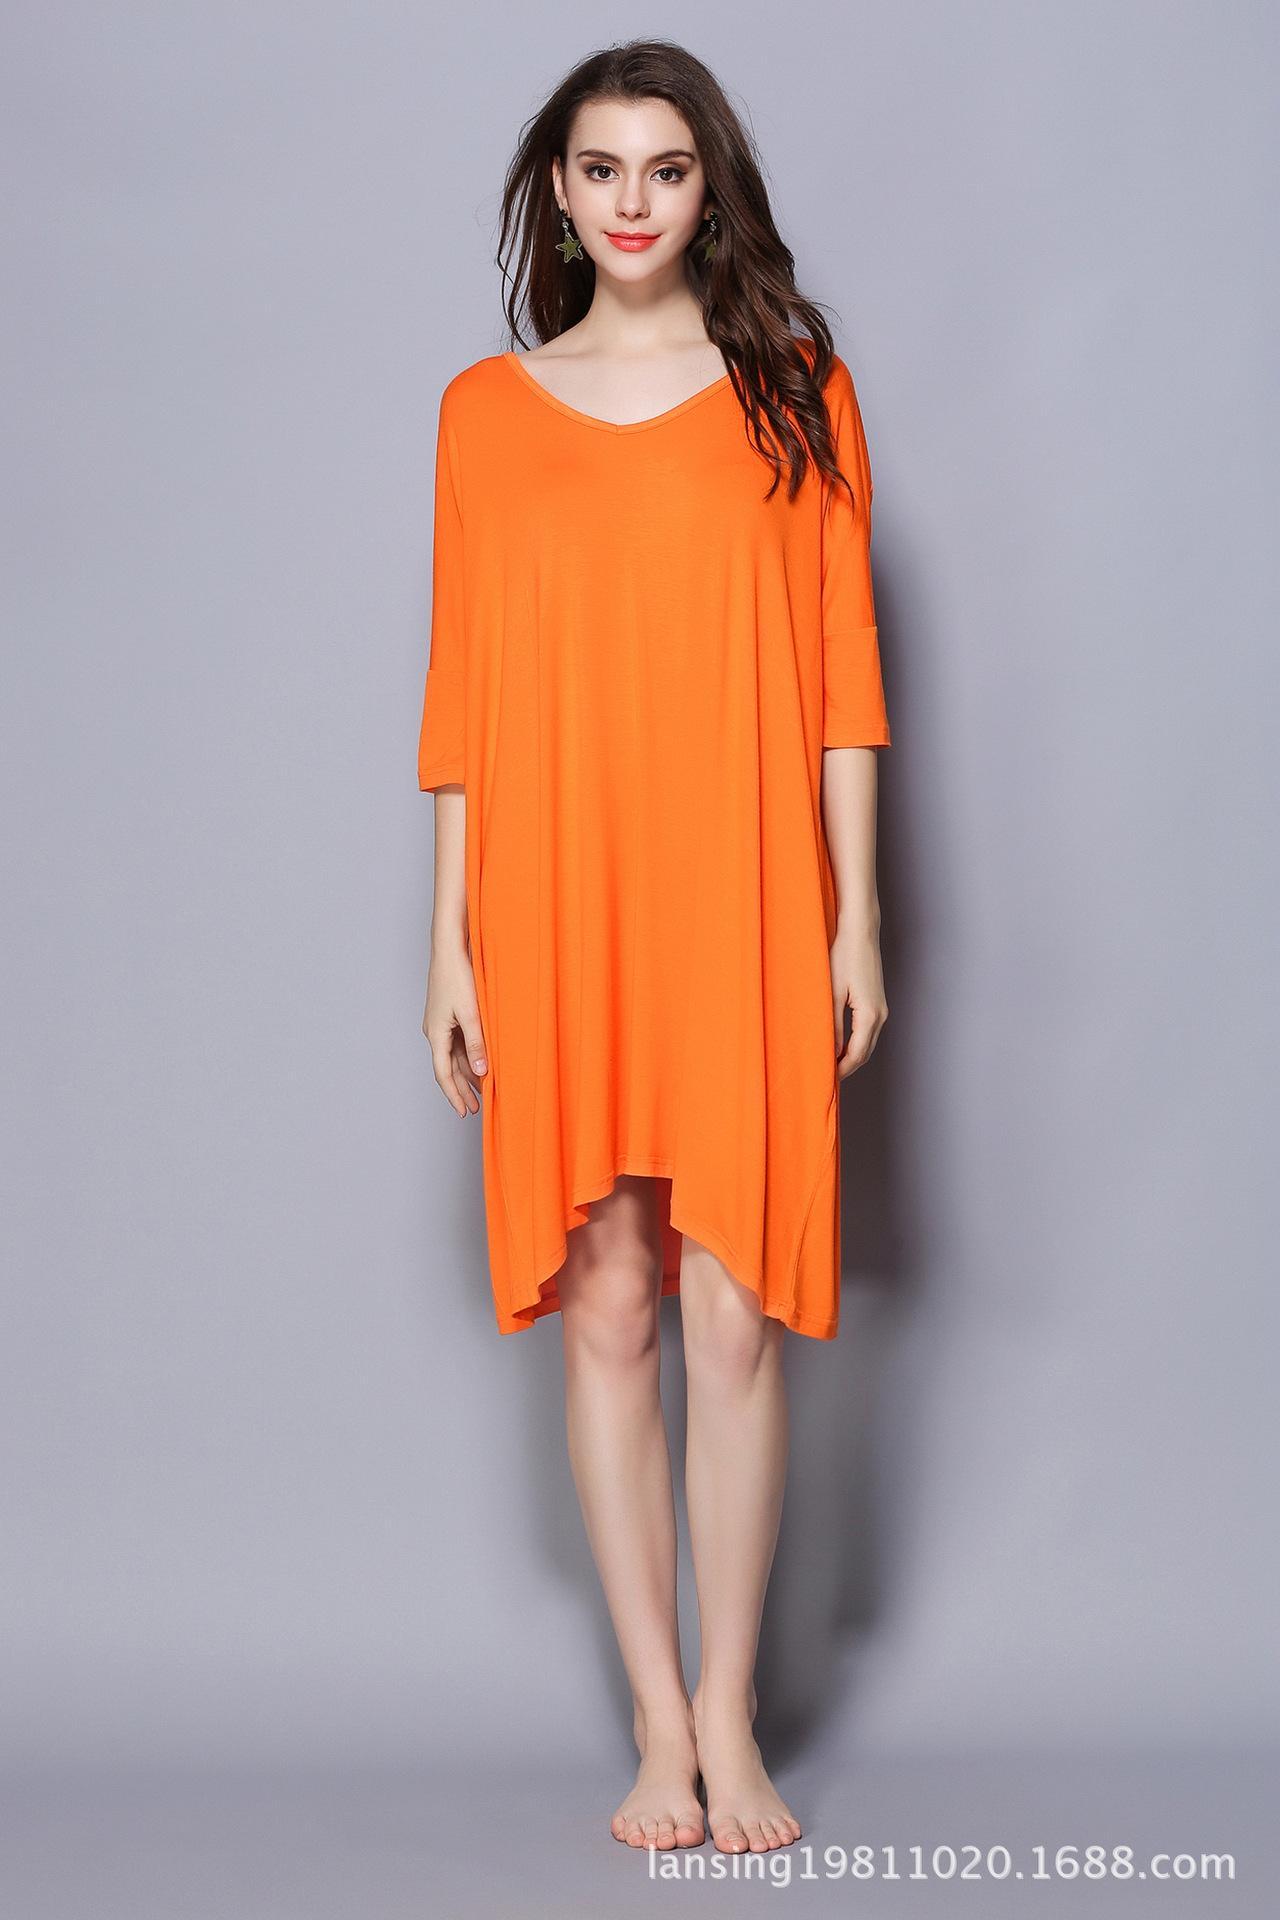 Nightdress spring and summer new medium and long T-shirt medium sleeve large size nightdress modal Pajama has fat plus size women Orange